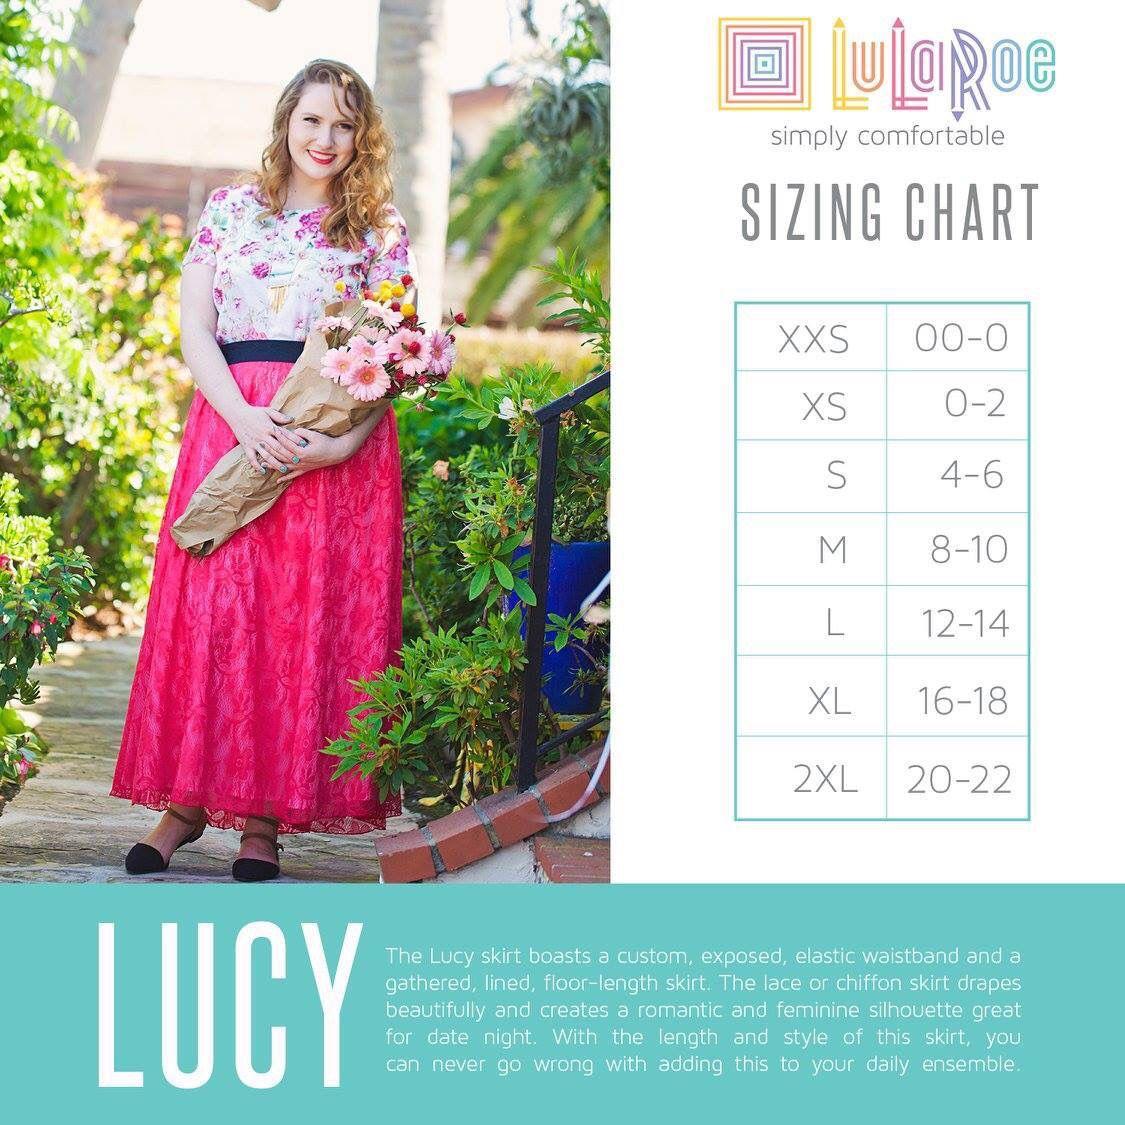 e246c78c16ffa Lucy www.facebook.com groups lularoeheatherturner More